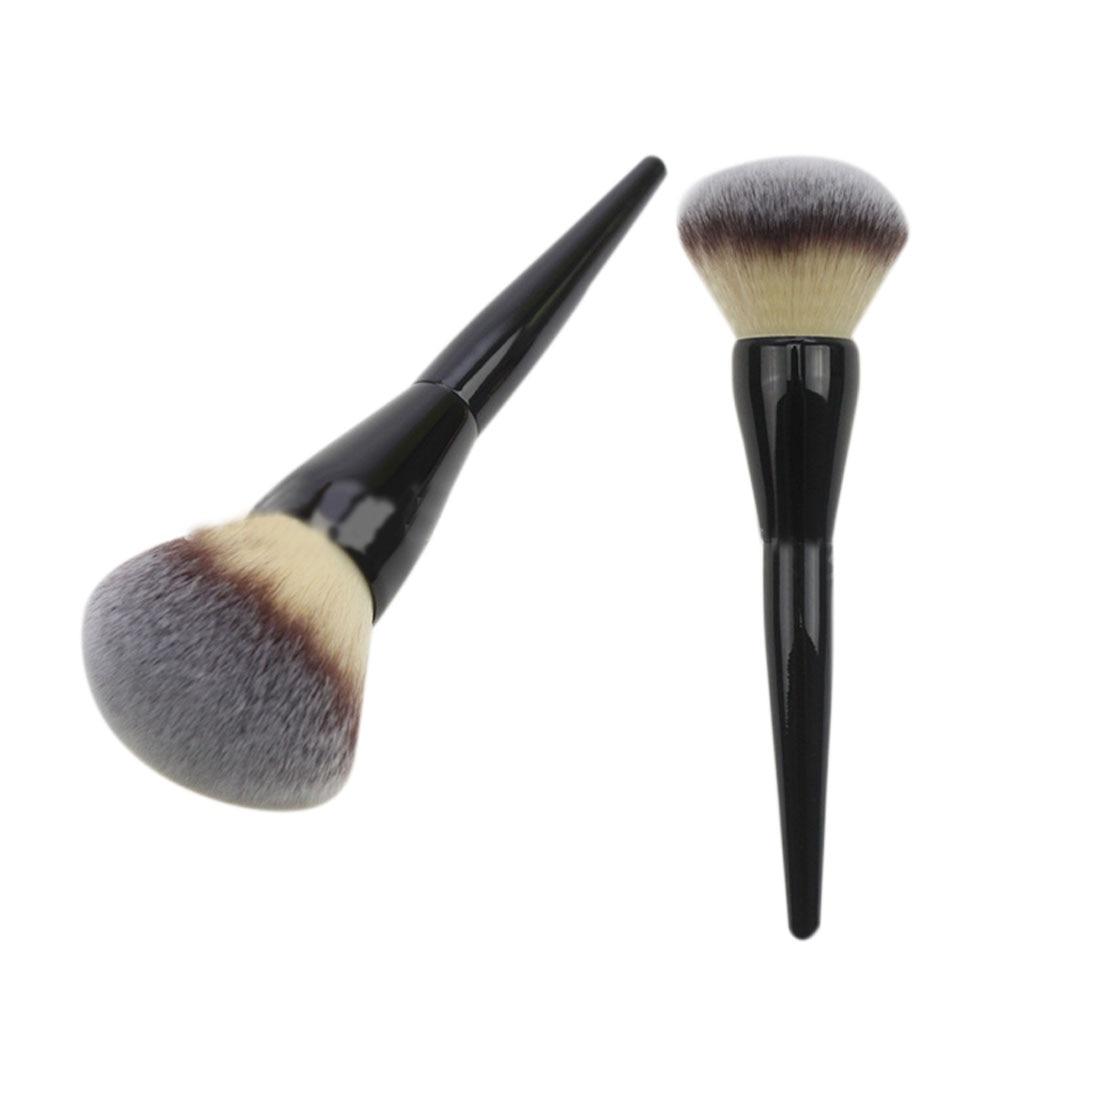 Big Size Beauty Powder Brush Blush Foundation Round Make Up Tool Large Cosmetics Aluminum Brushes Soft Face Makeup mac beauty powder too chic украина